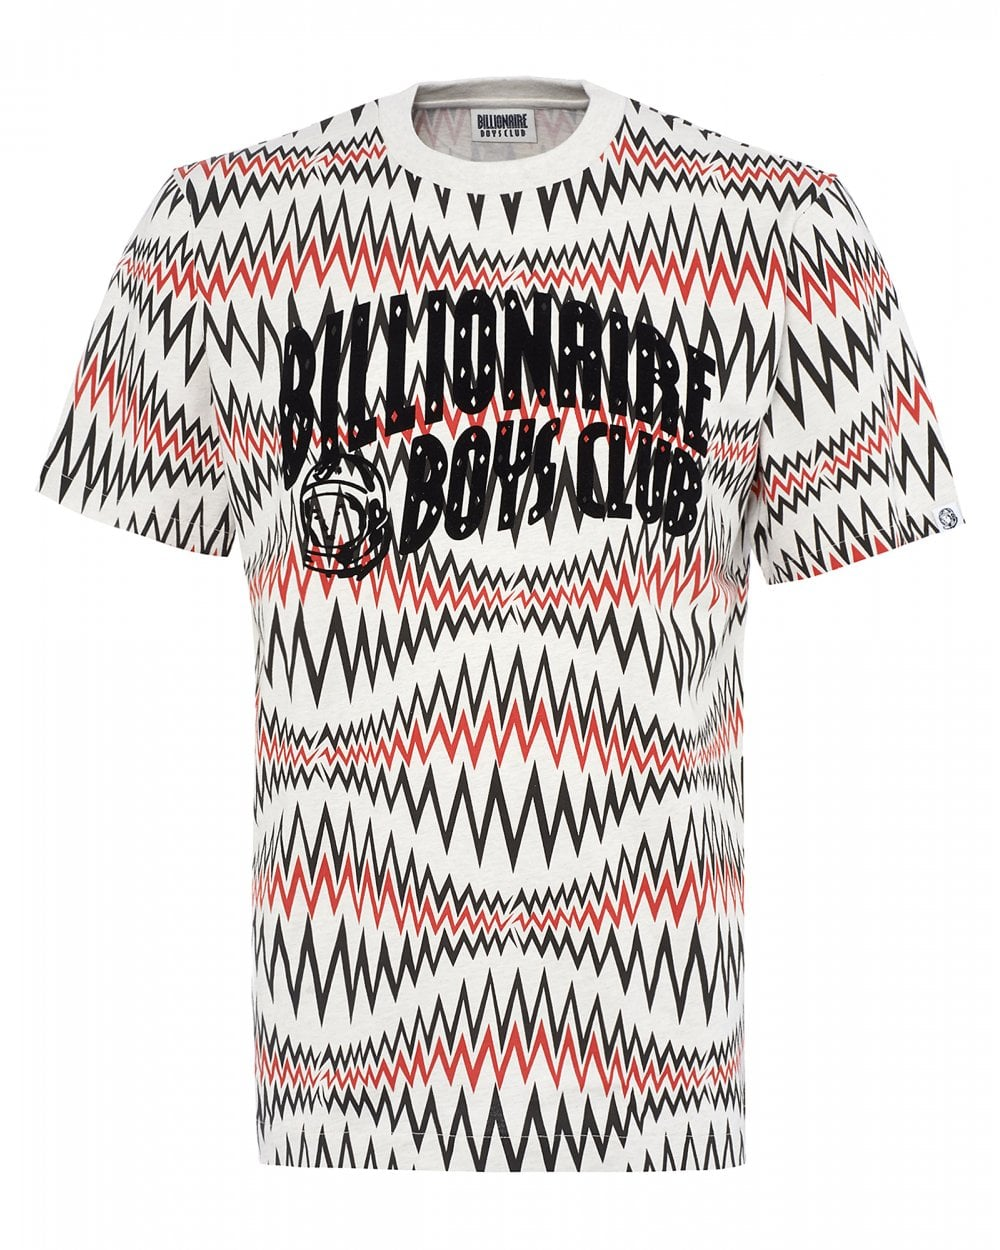 d237ec8a Billionaire Boys Club Mens Sound Wave T-Shirt, White Marl Tee